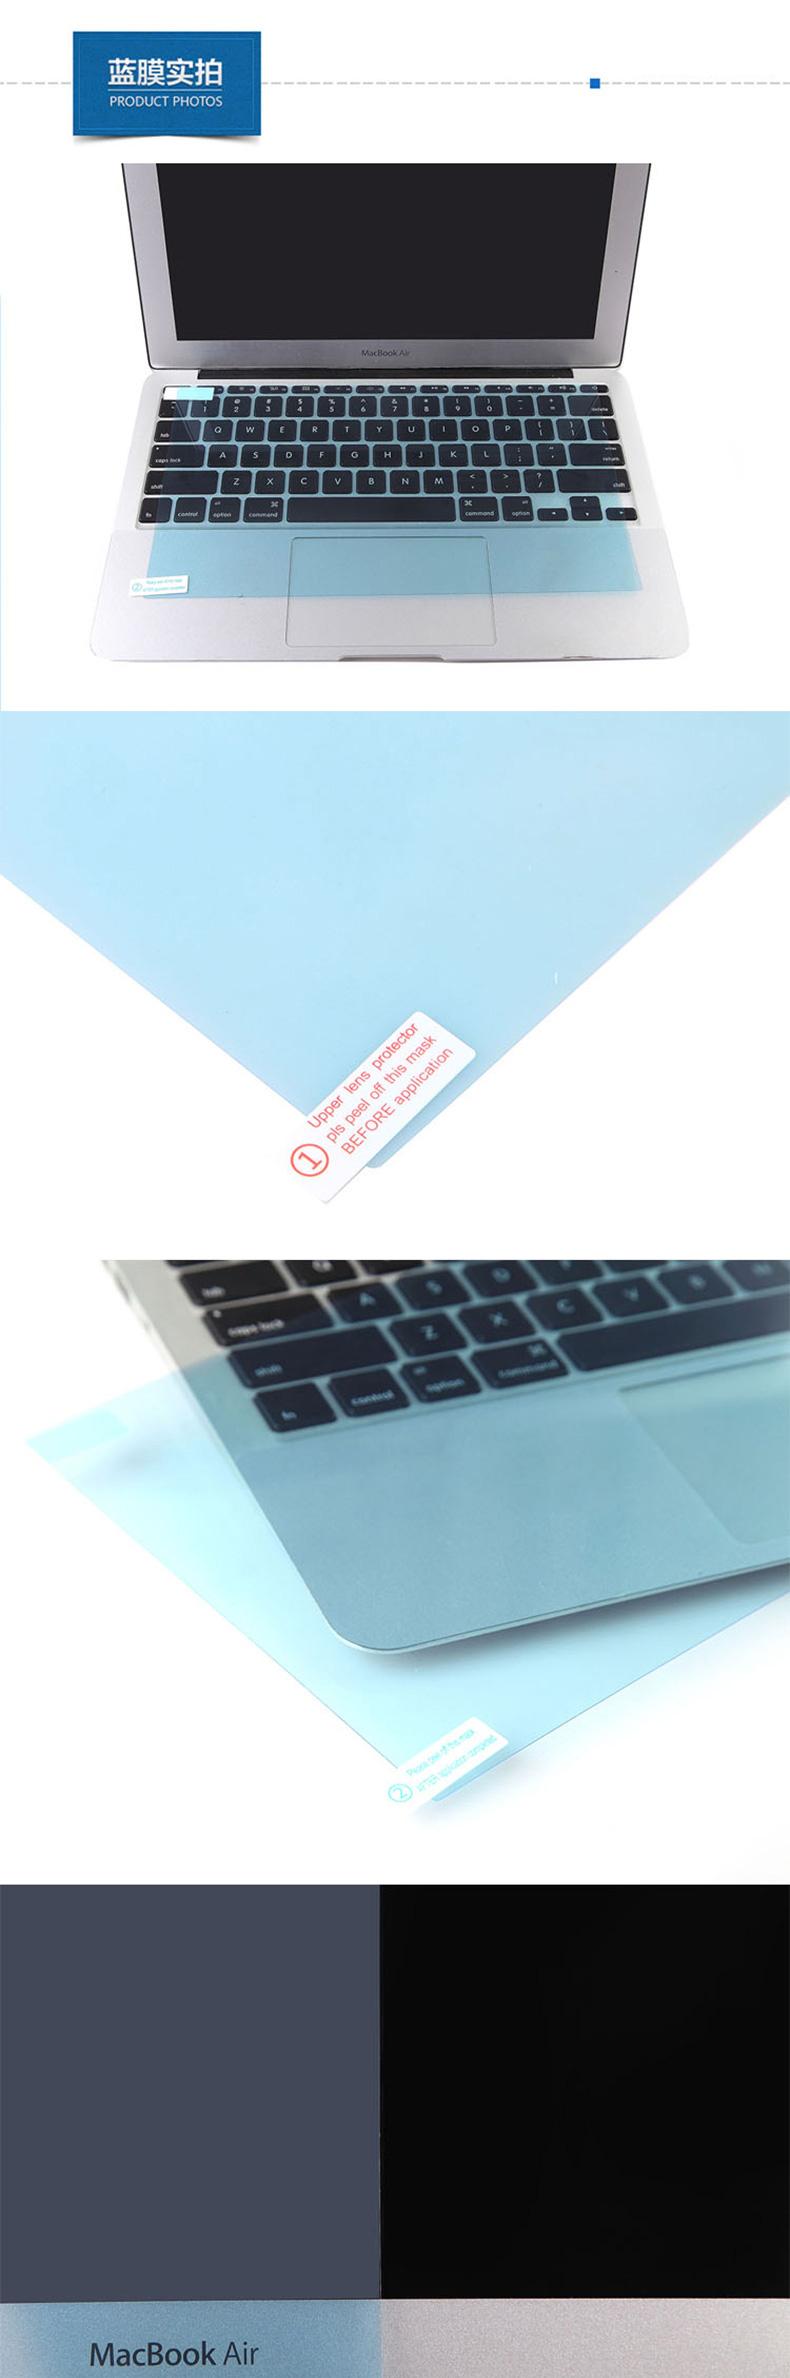 Dán Macbook  12 MacBook A1534 ACD ACD A1932 - ảnh 39